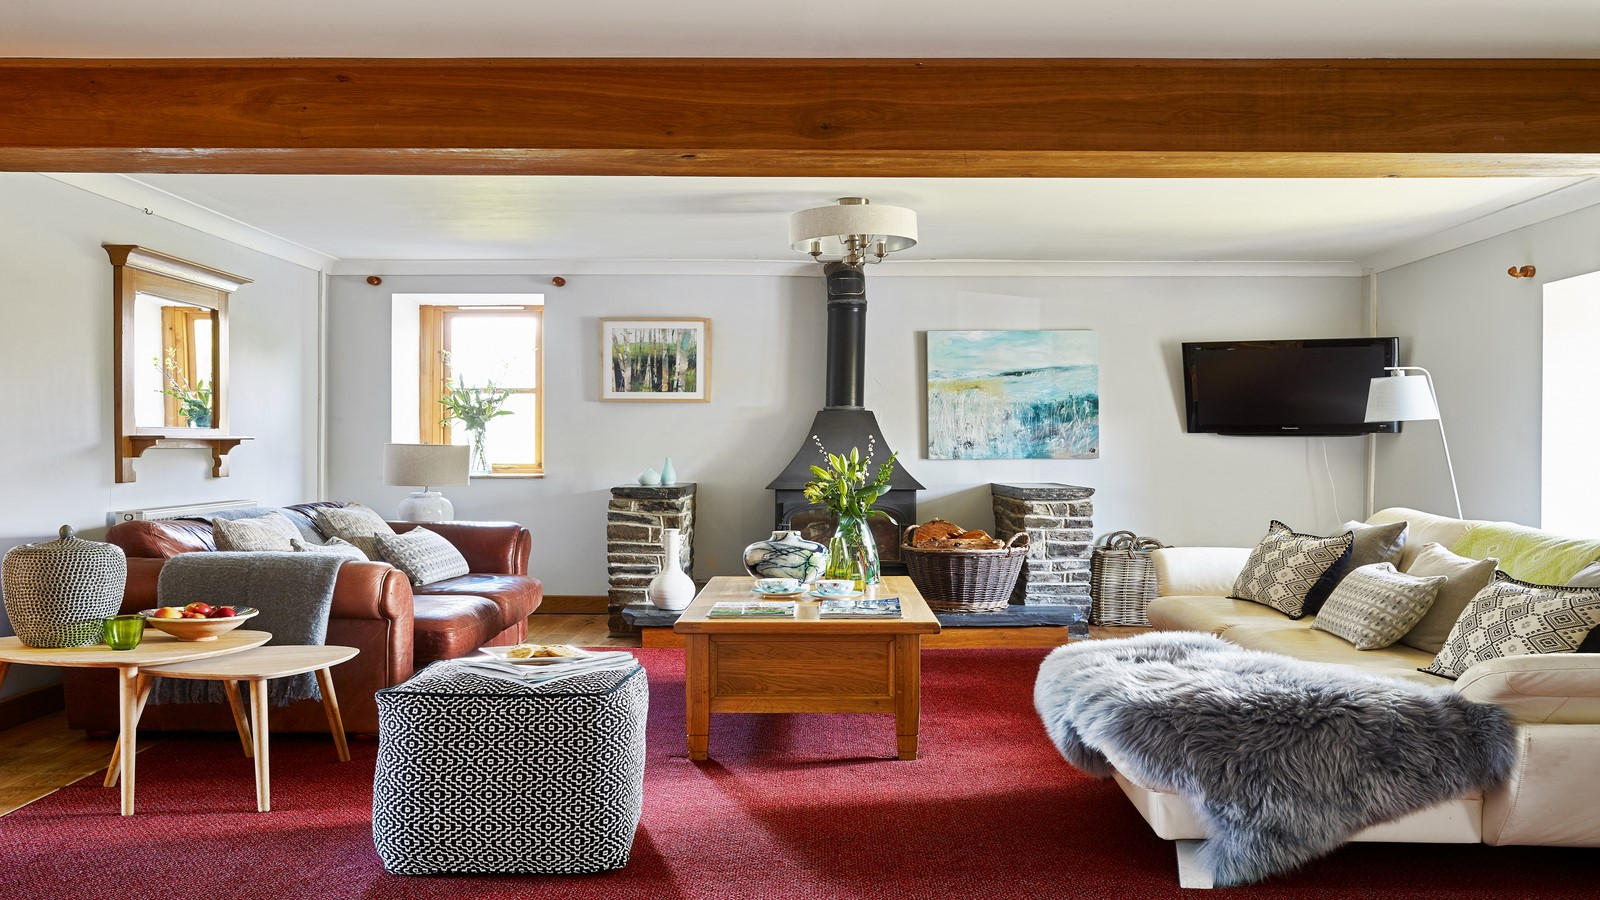 Farm house lounge 4000 x 2250